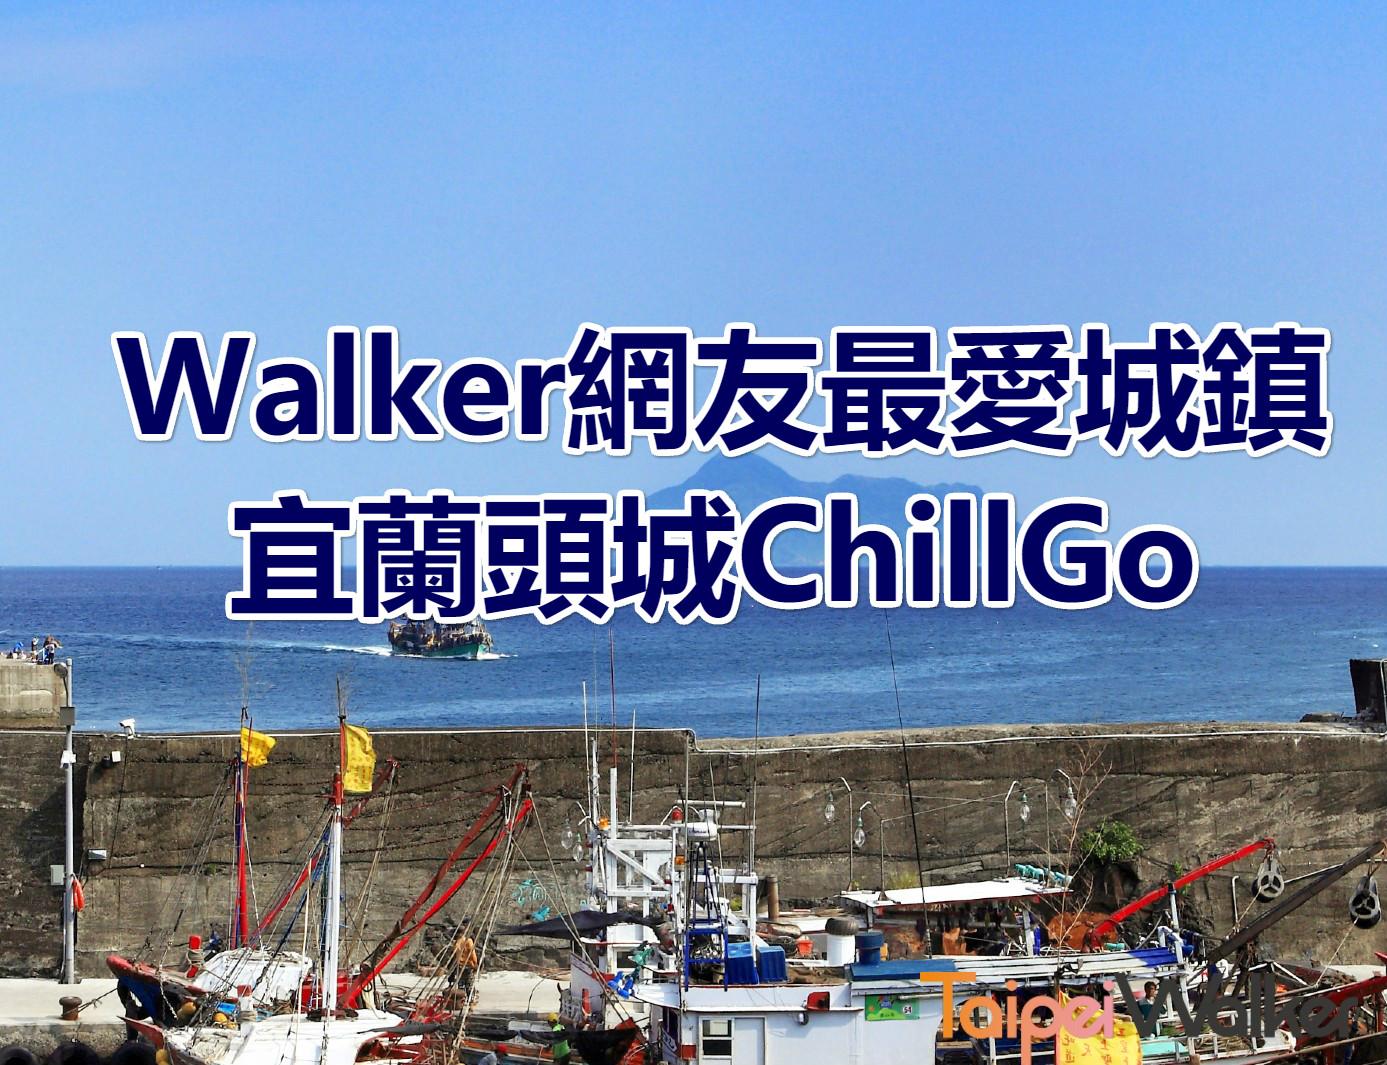 【Walker × 國光威樂】Walker網友最愛城鎮 宜蘭頭城ChillGo一日遊(walker03)